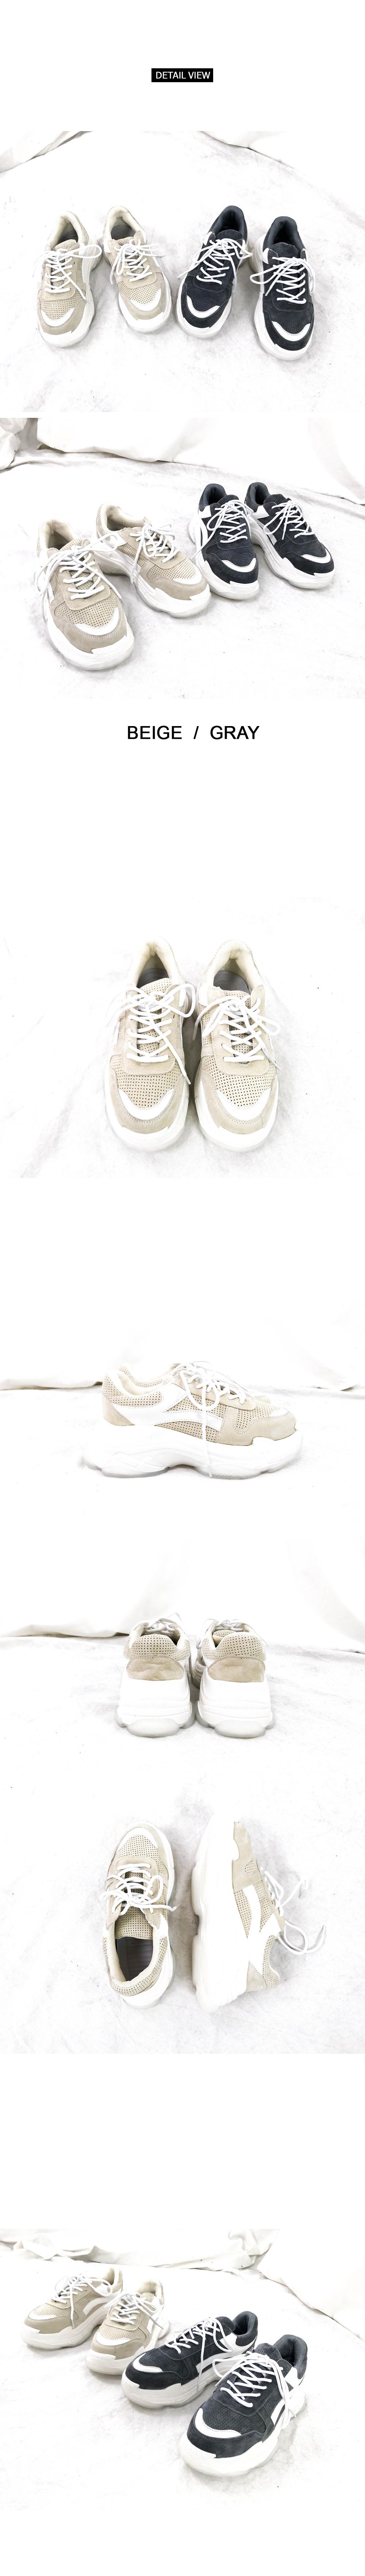 Soft-key-level sneakers (sh679)